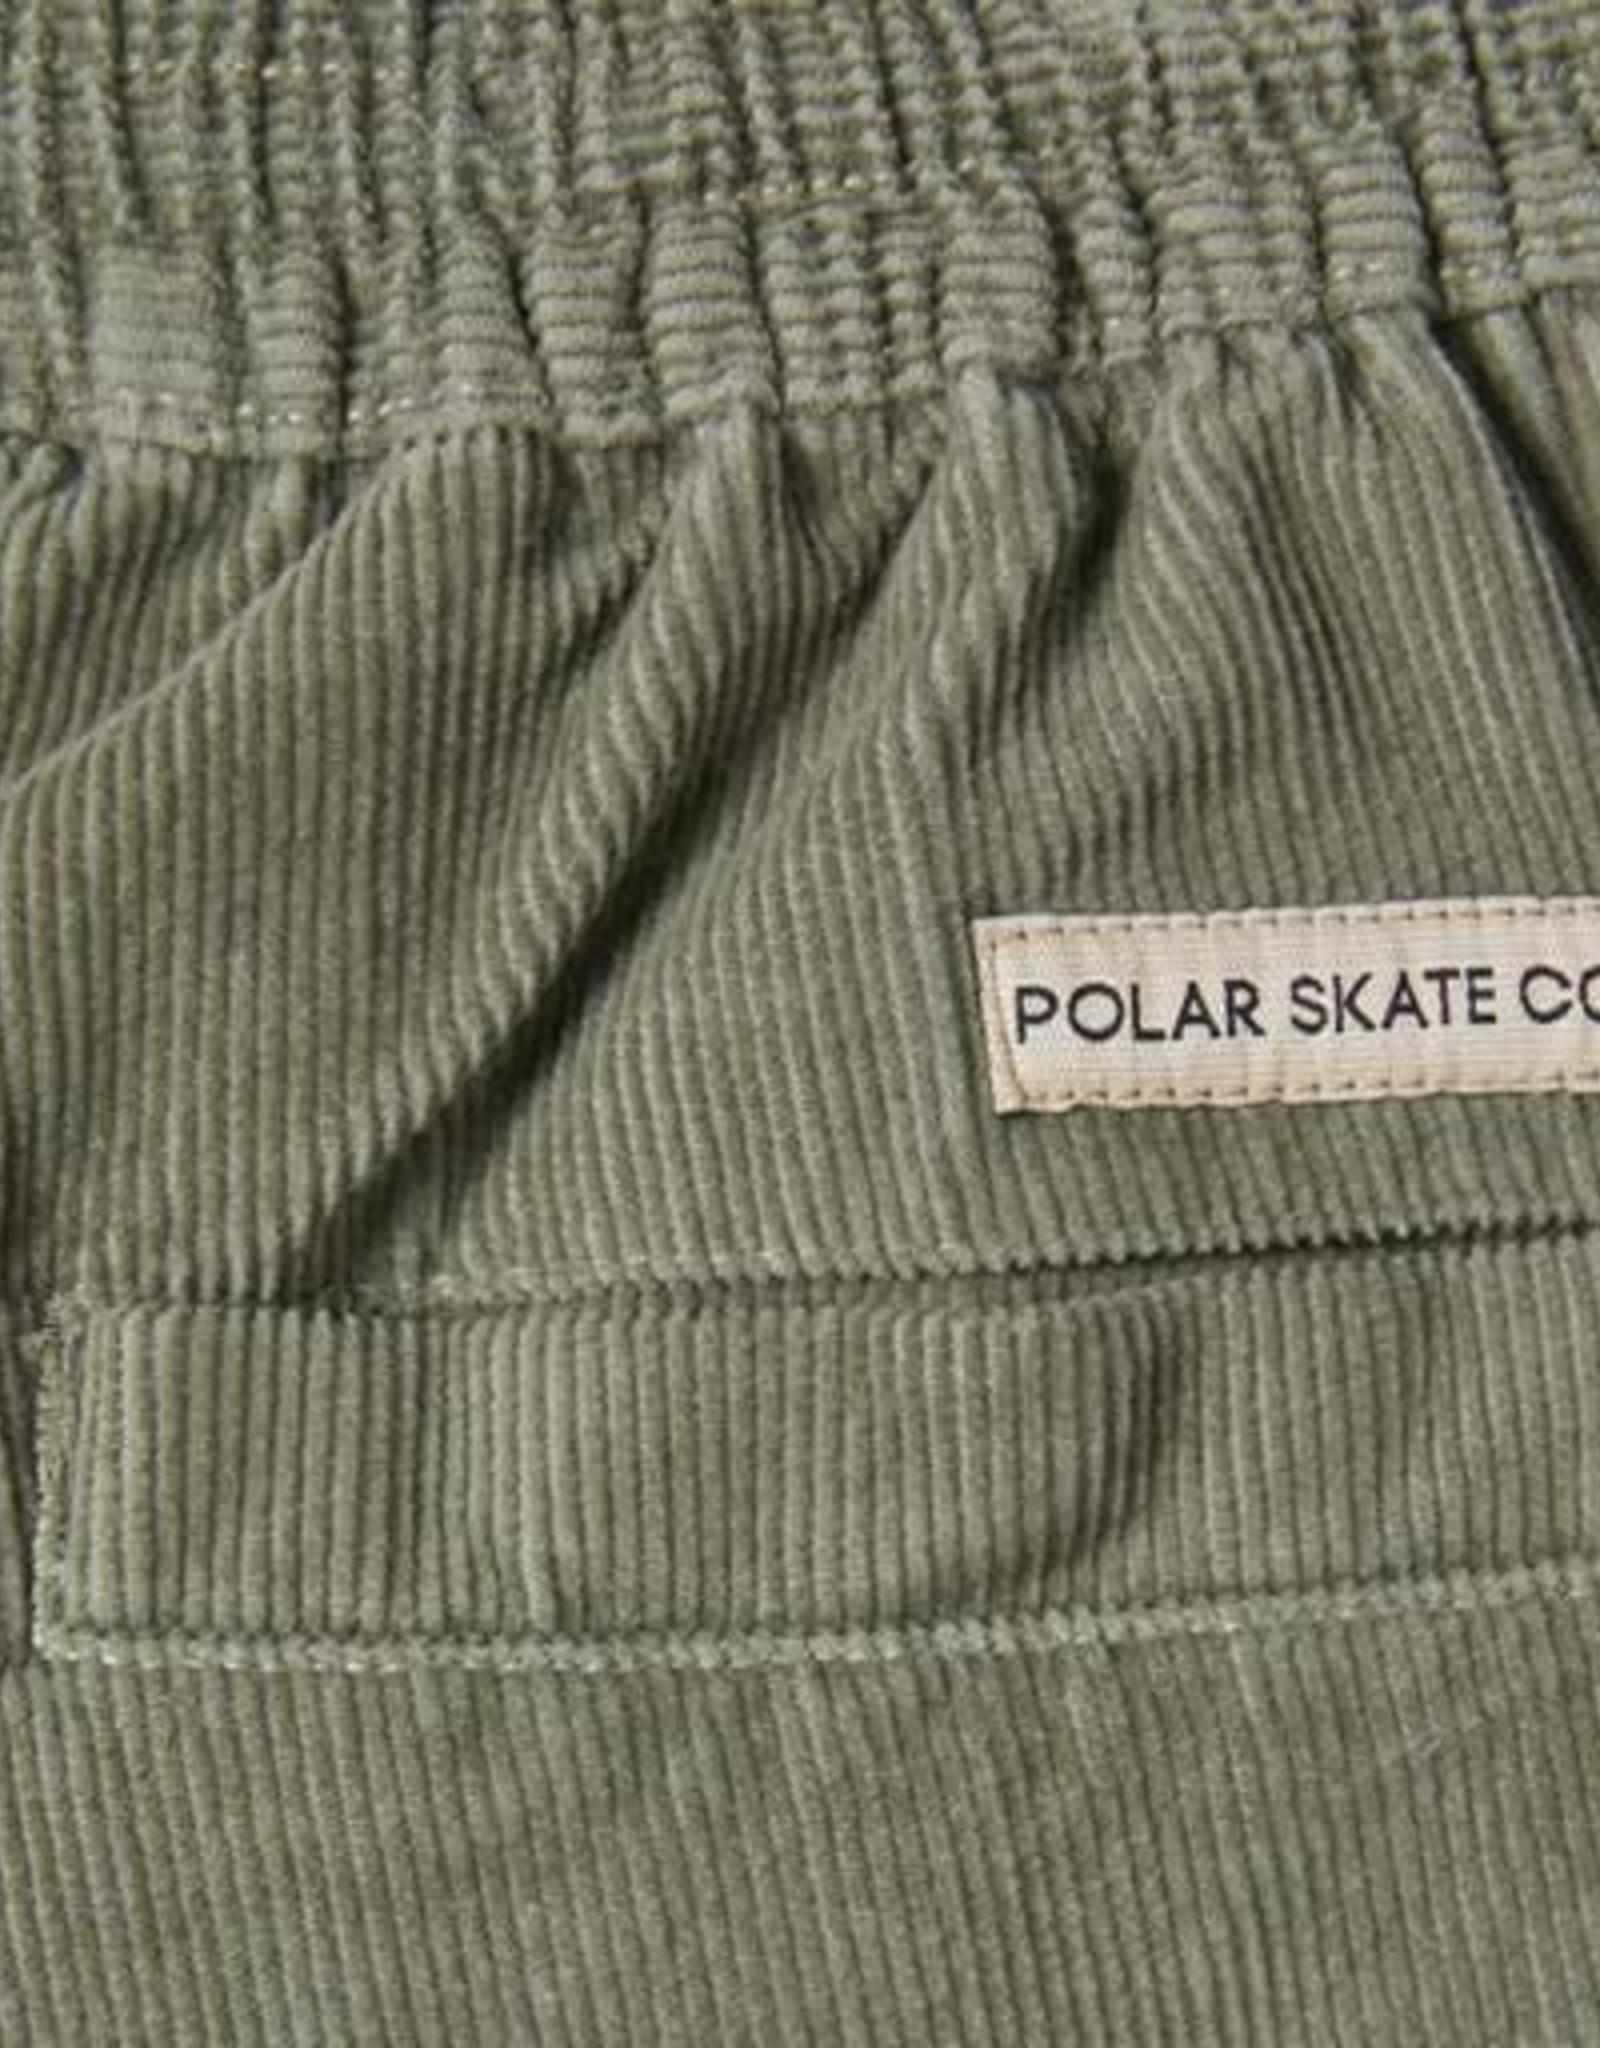 POLAR CORDUROY SURF PANT - SMOKE